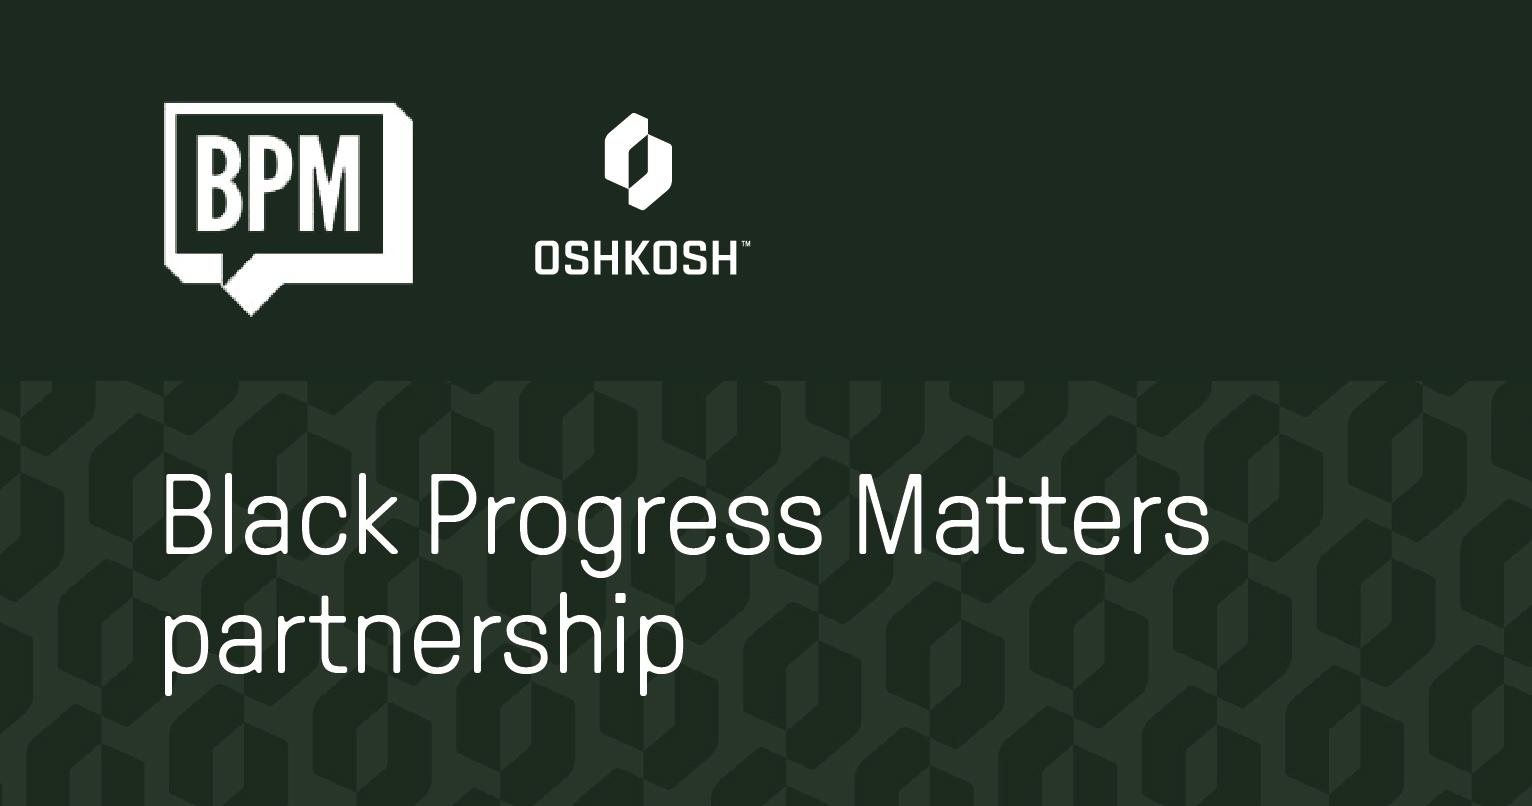 Black Partner Matters partnership graphic with green background, Oshkosh Corporation logo and BPM logo